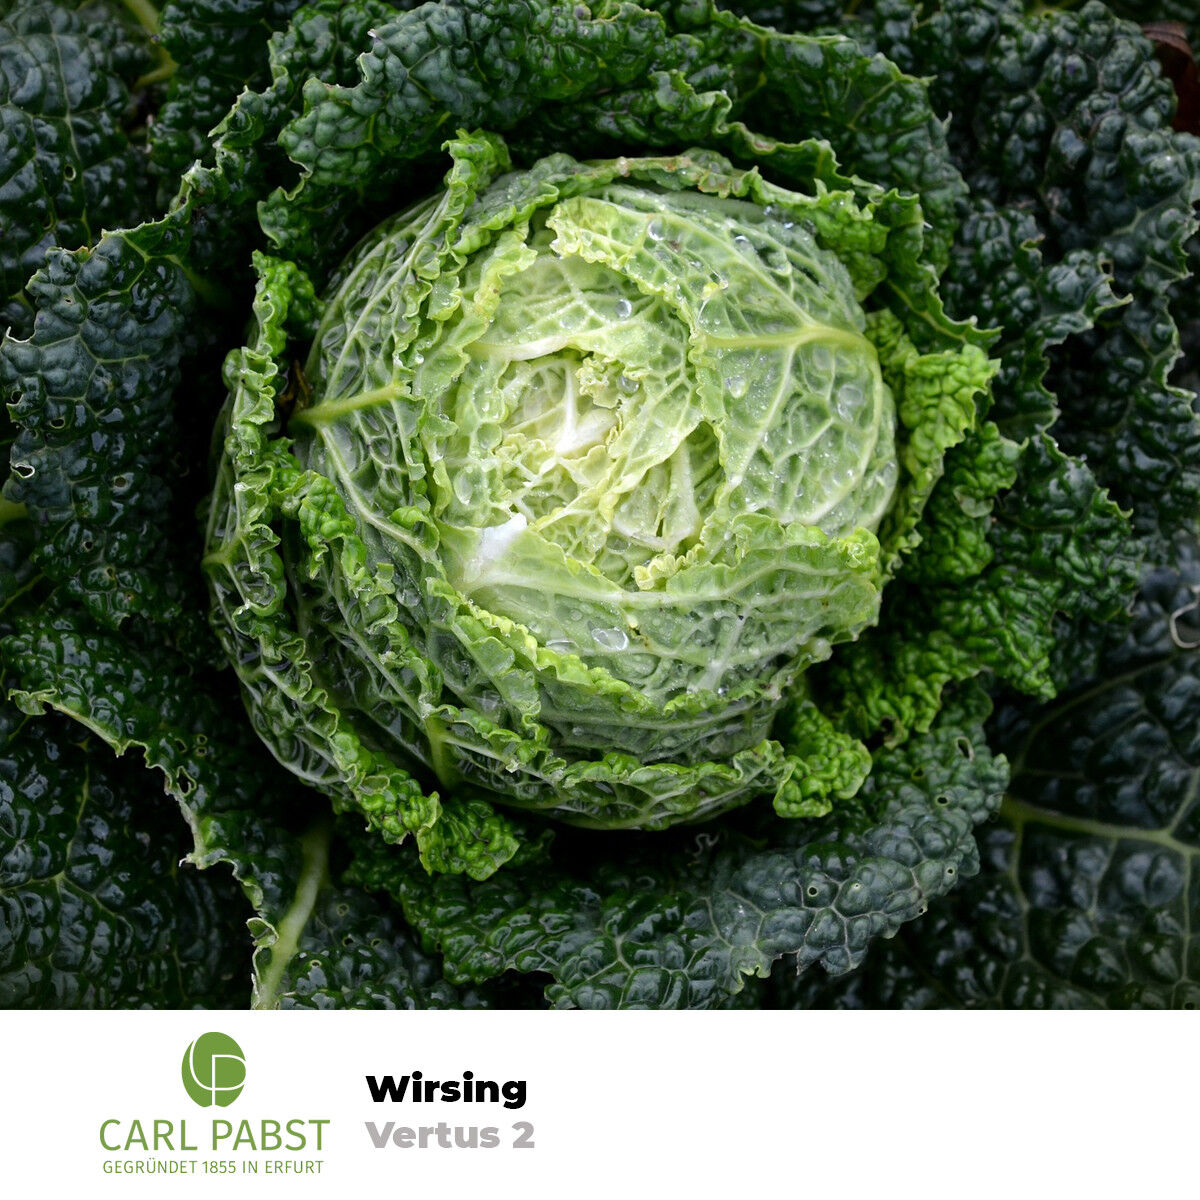 🥬 Kohl Samen Wirsing Vertus 2 Wirsingkohl Welschkohl Welschkraut 80 Pflanzen